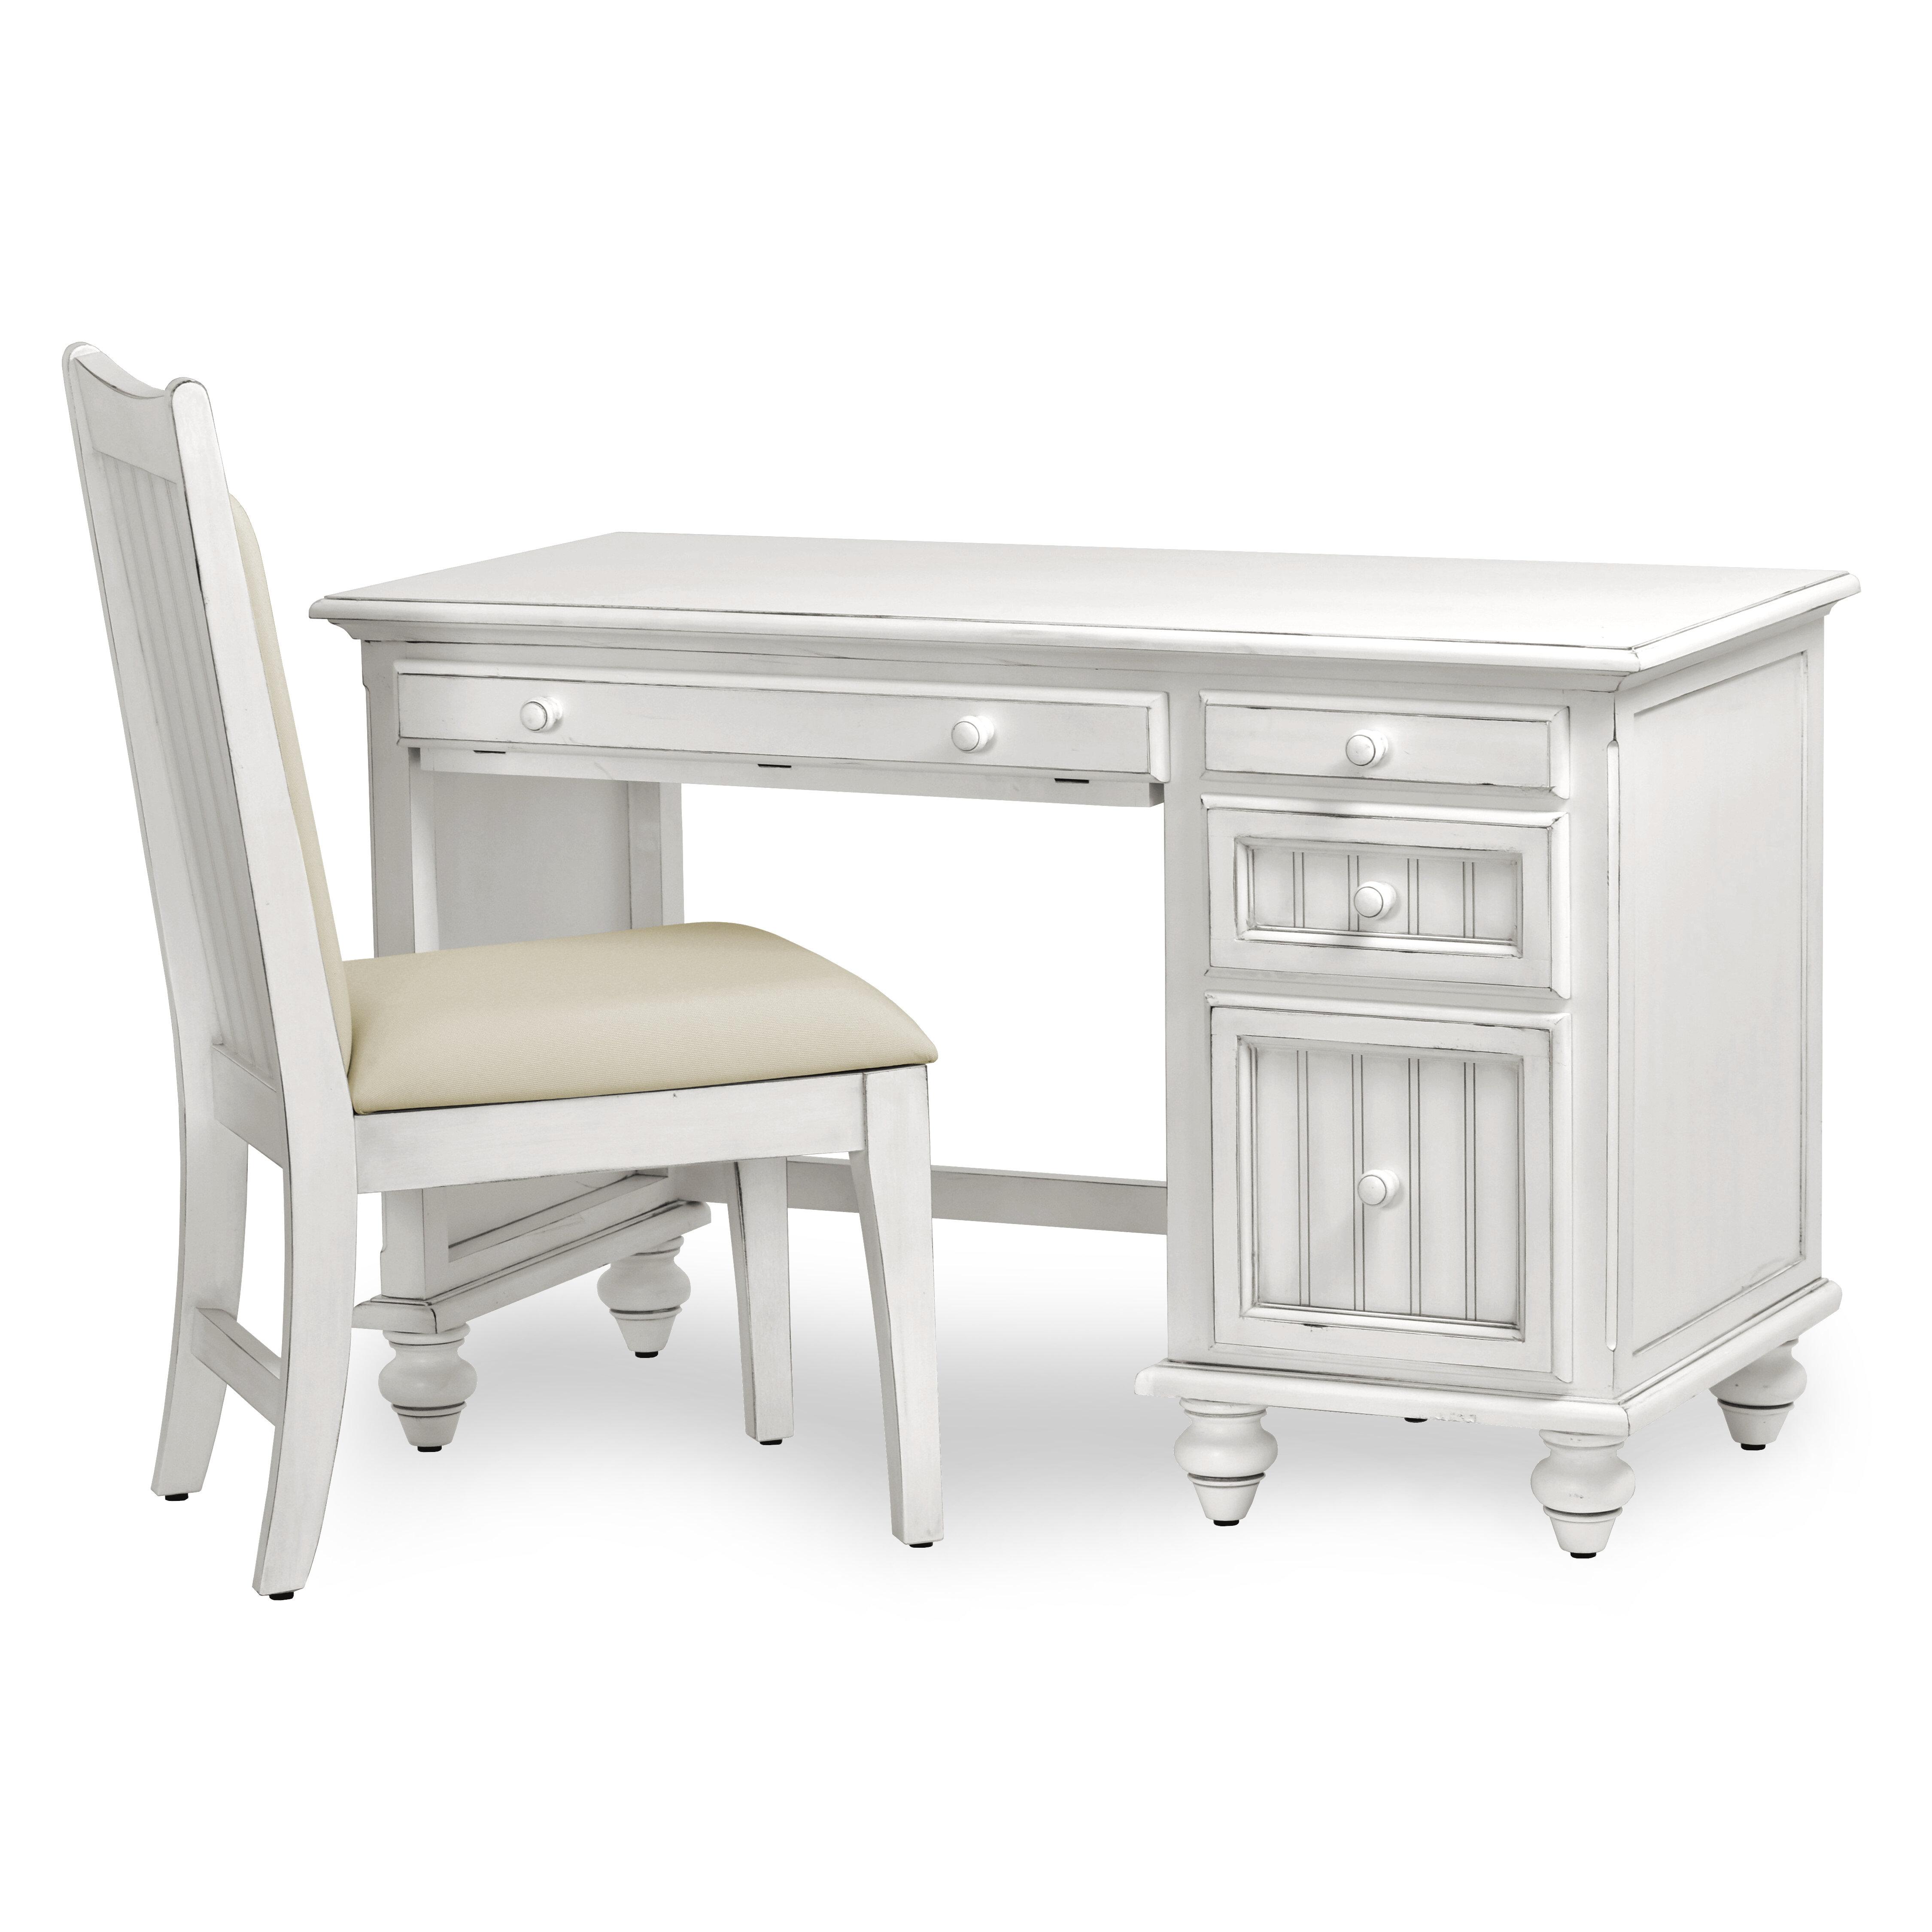 Image of: Highland Dunes Kolya Desk And Computer Desk Chair Set Wayfair